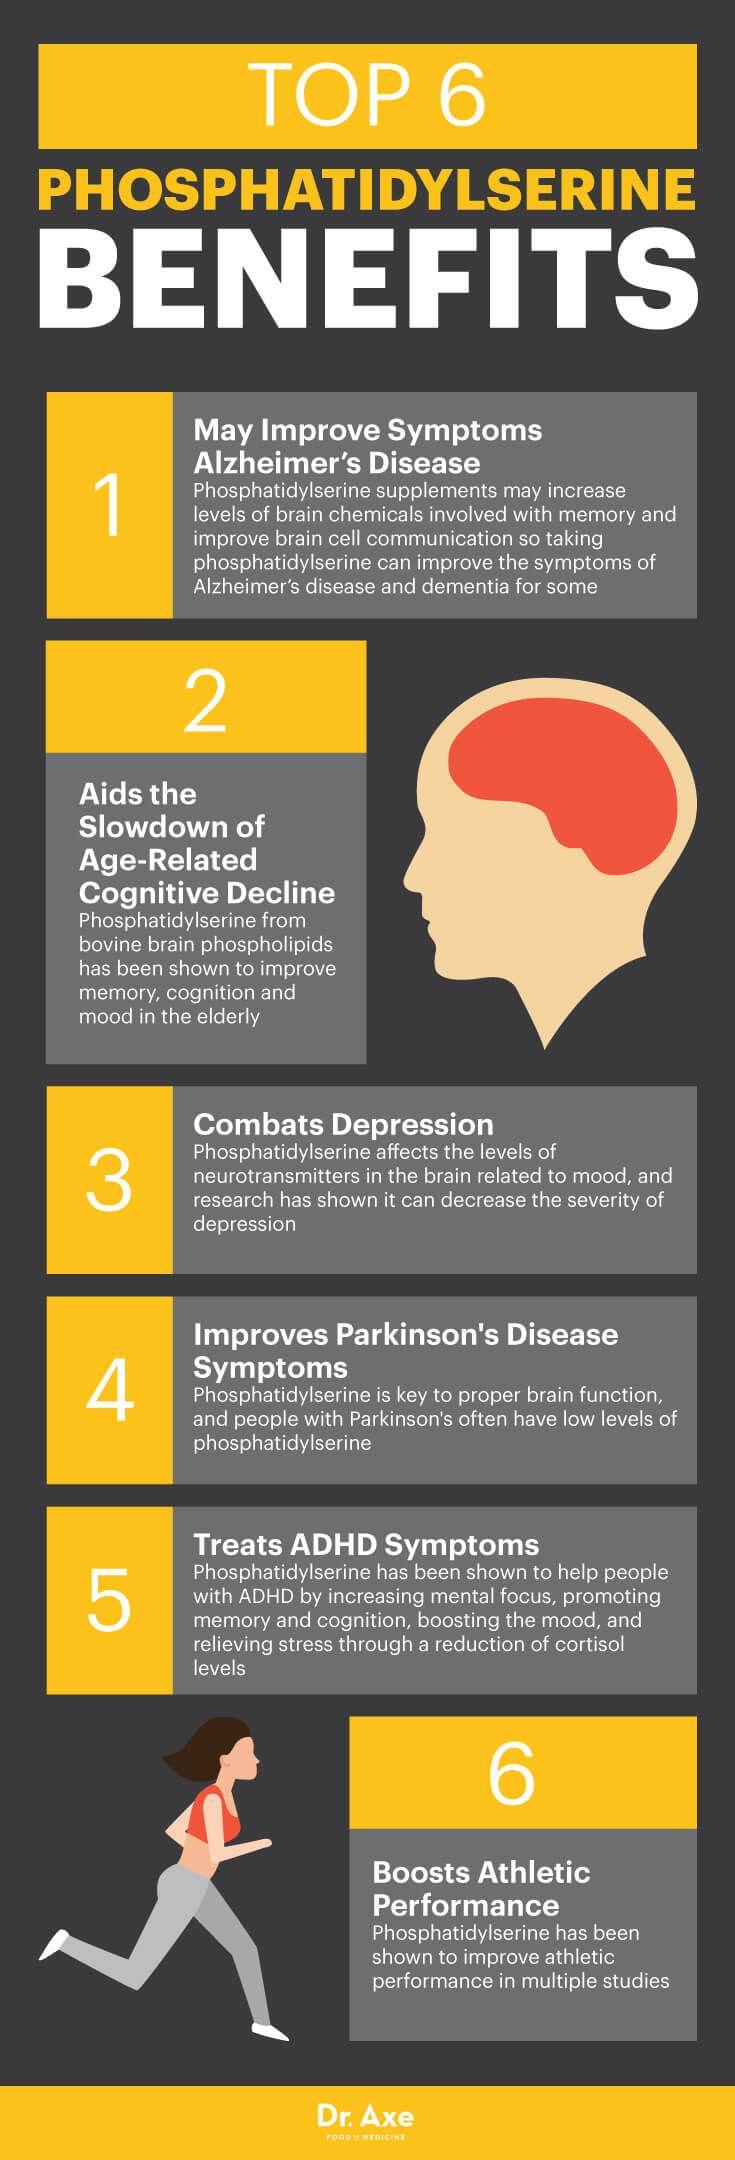 Phosphatidylserine benefits - Dr. Axe http://www.draxe.com #health #holistic #natural